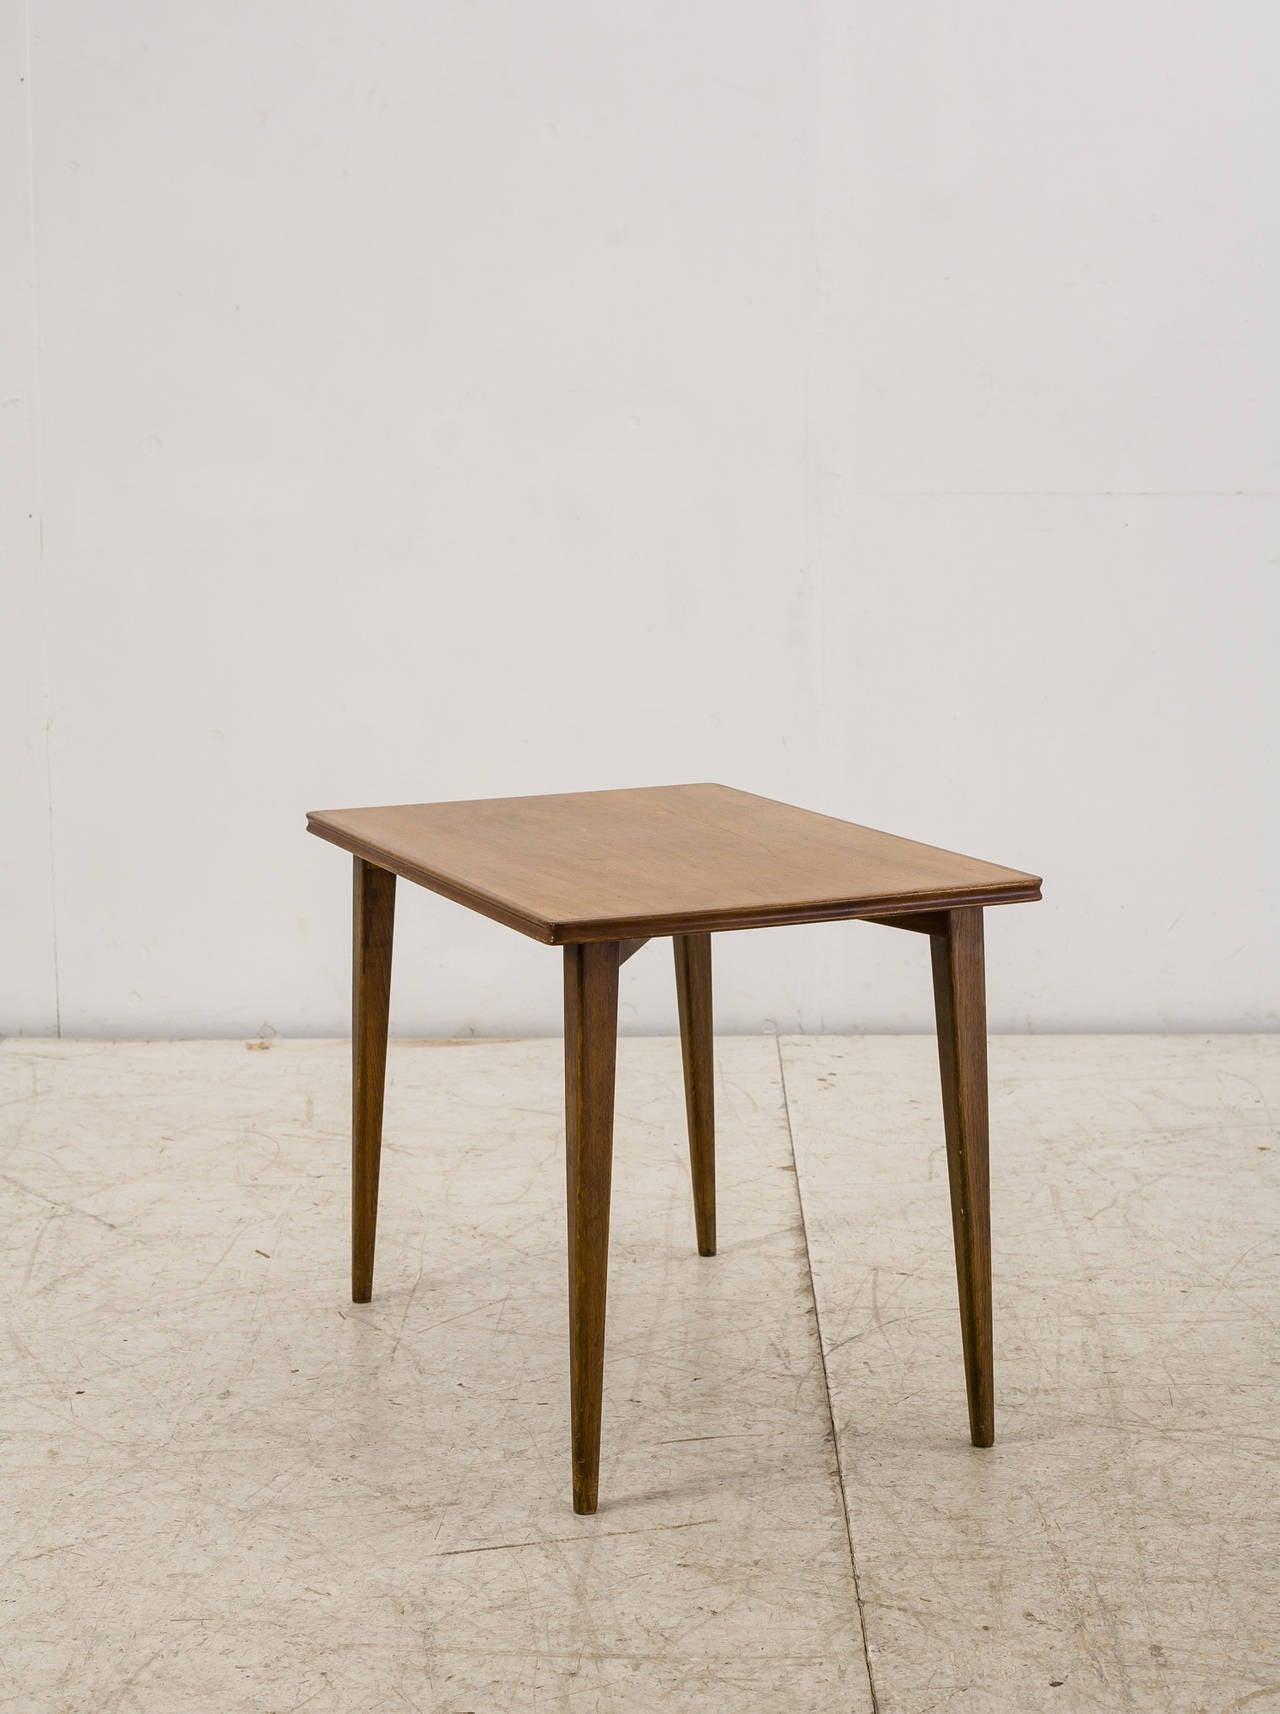 Palle Suenson Small Wooden Side Table, Denmark, 1940s 3